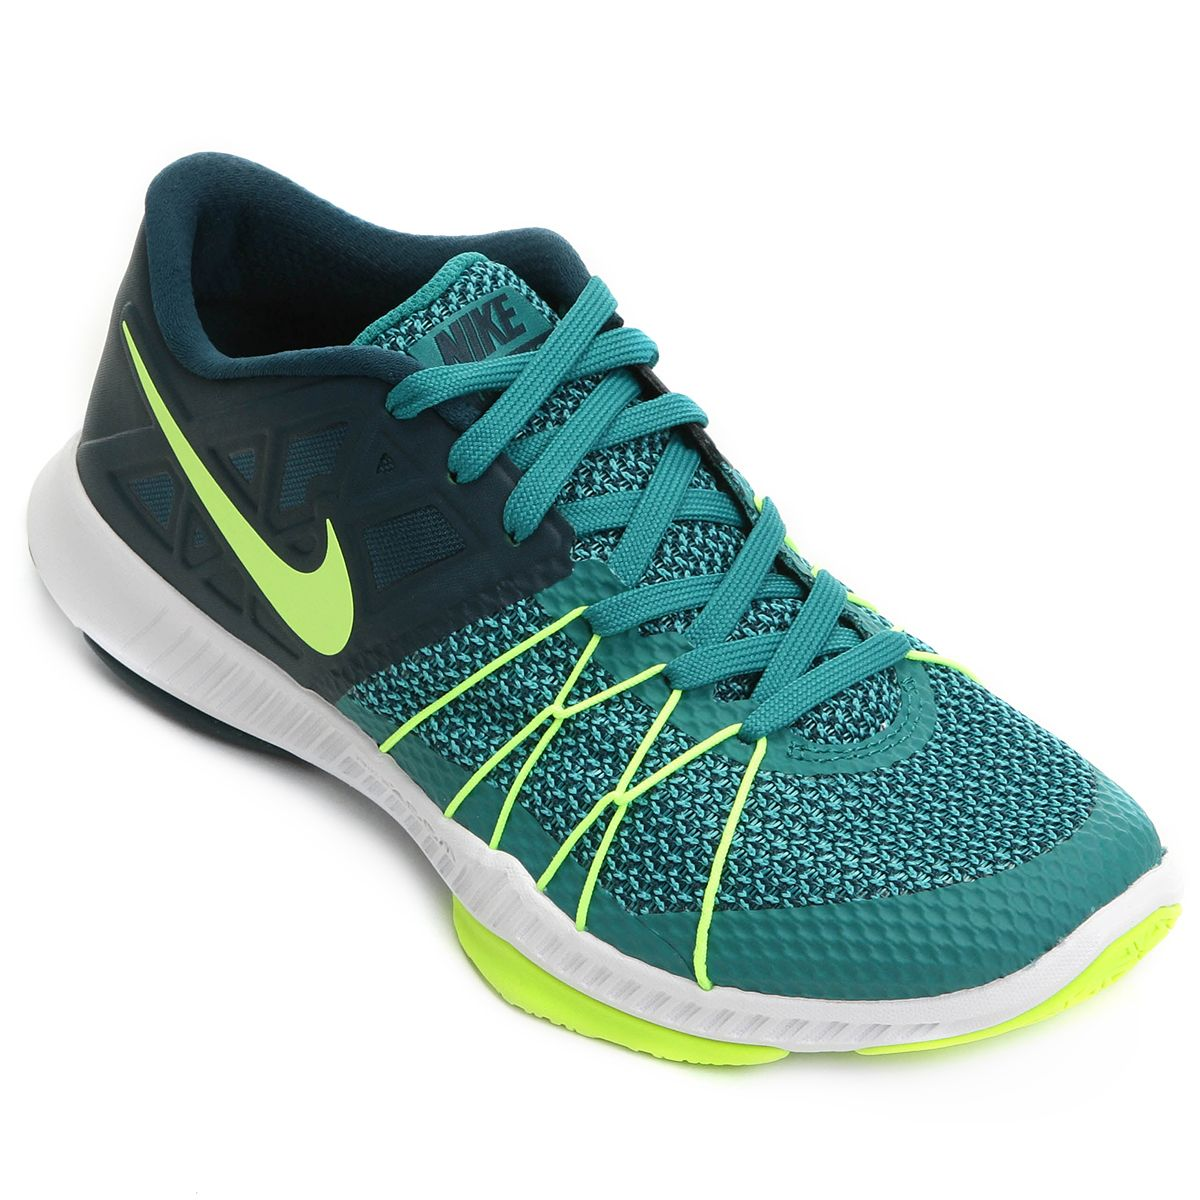 ec6b47a91e Tênis Nike Zoom Train Augmento Masculino - Verde escuro | Sapatos ...